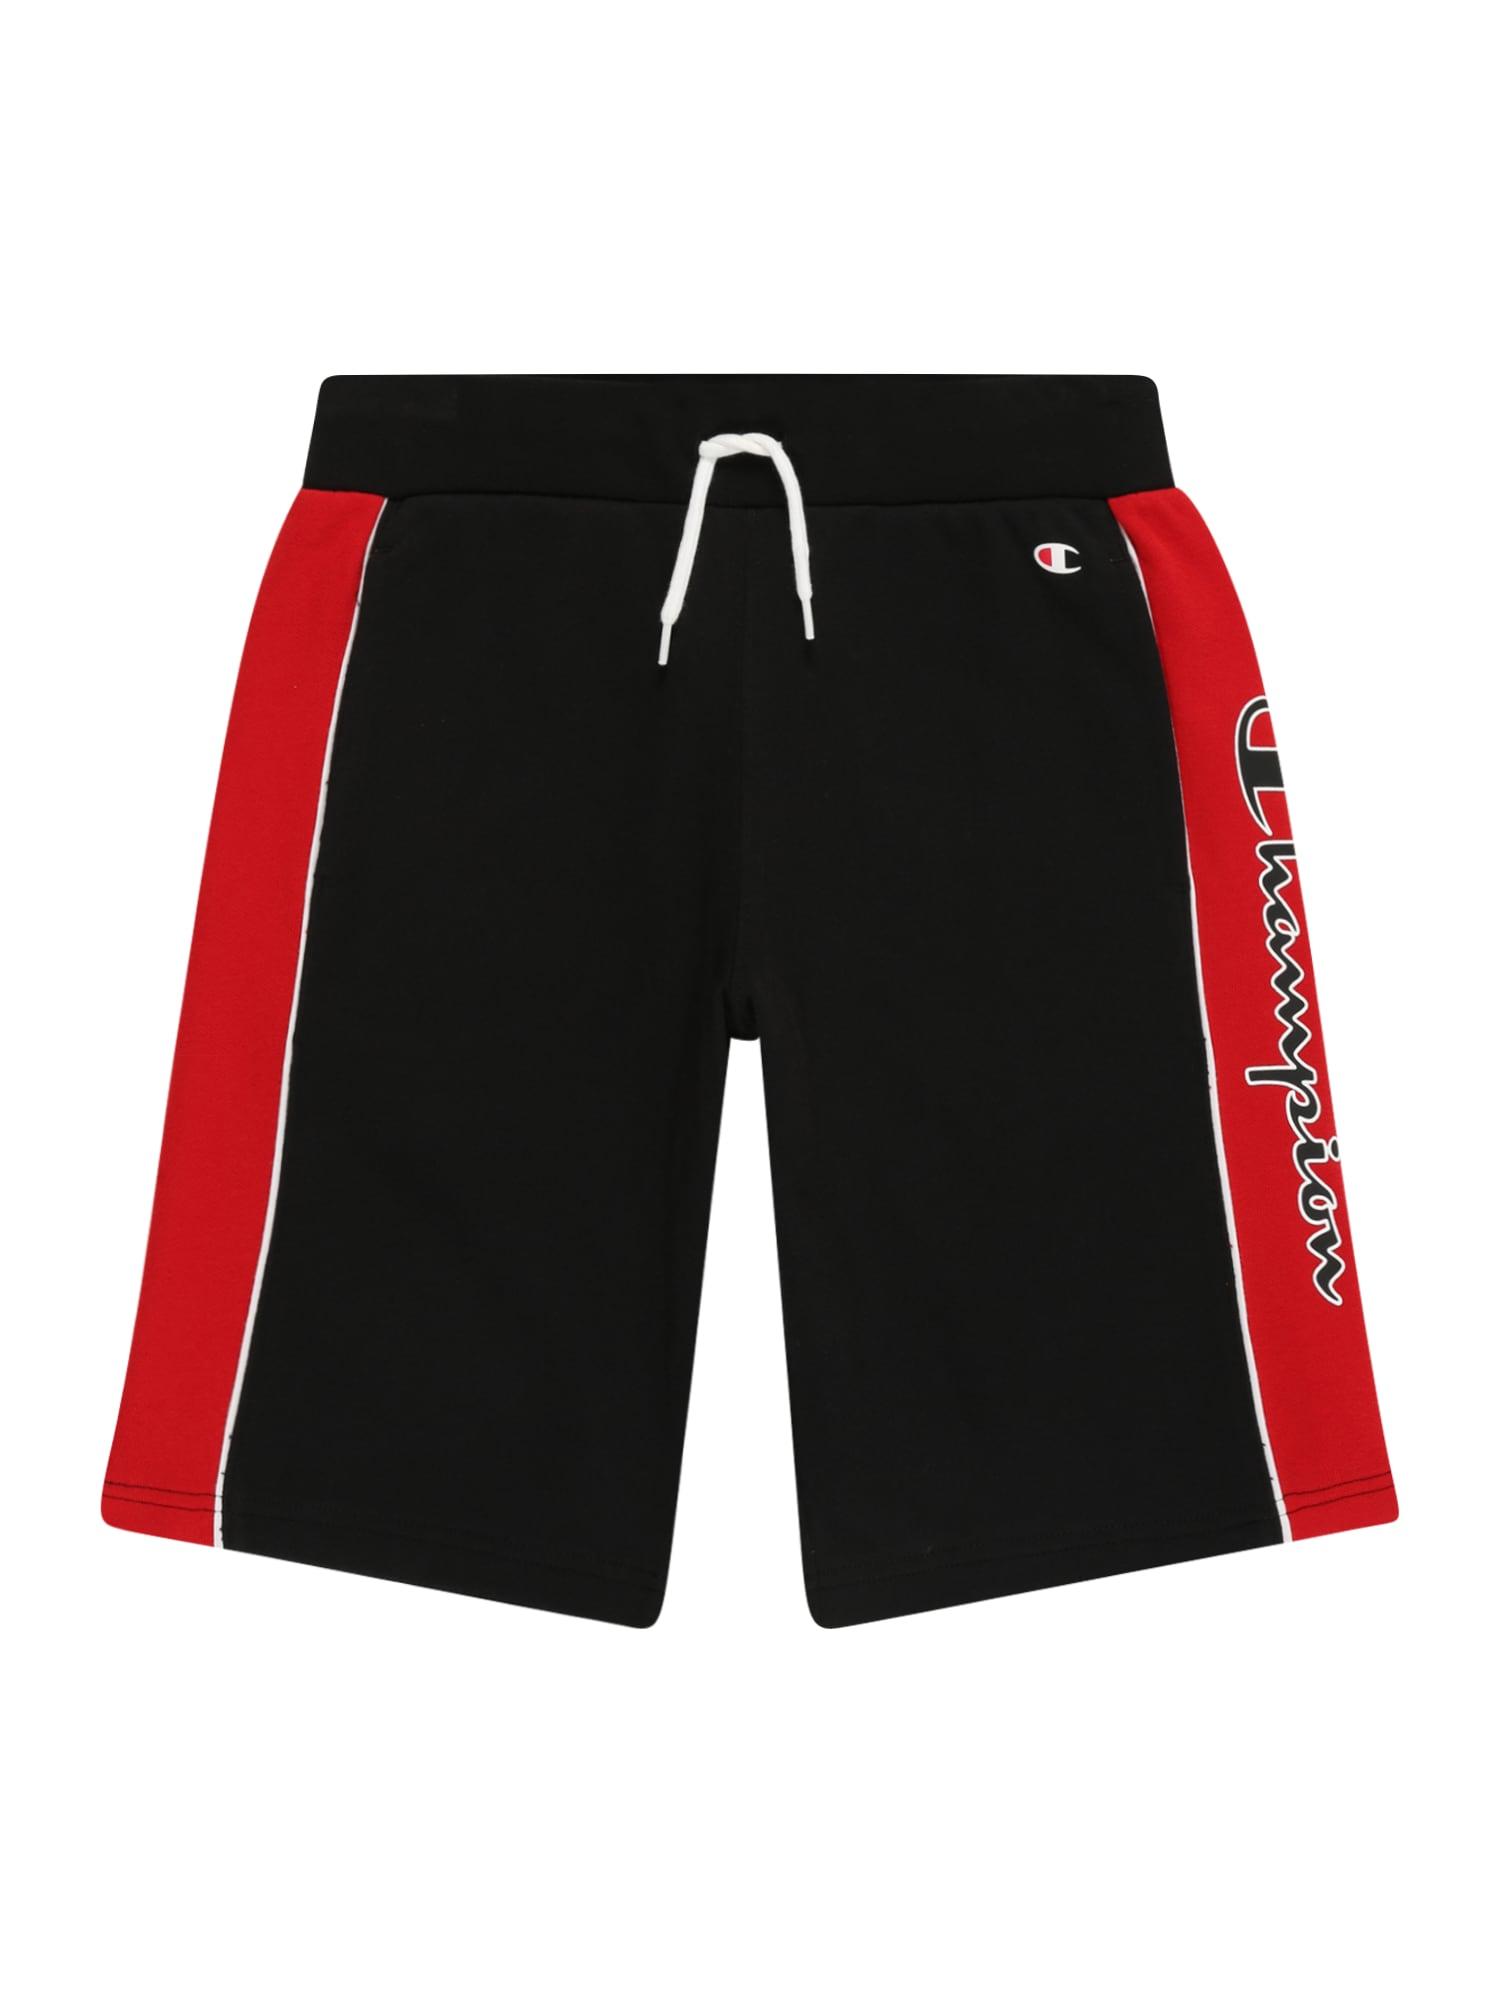 Champion Authentic Athletic Apparel Kelnės juoda / raudona / balta